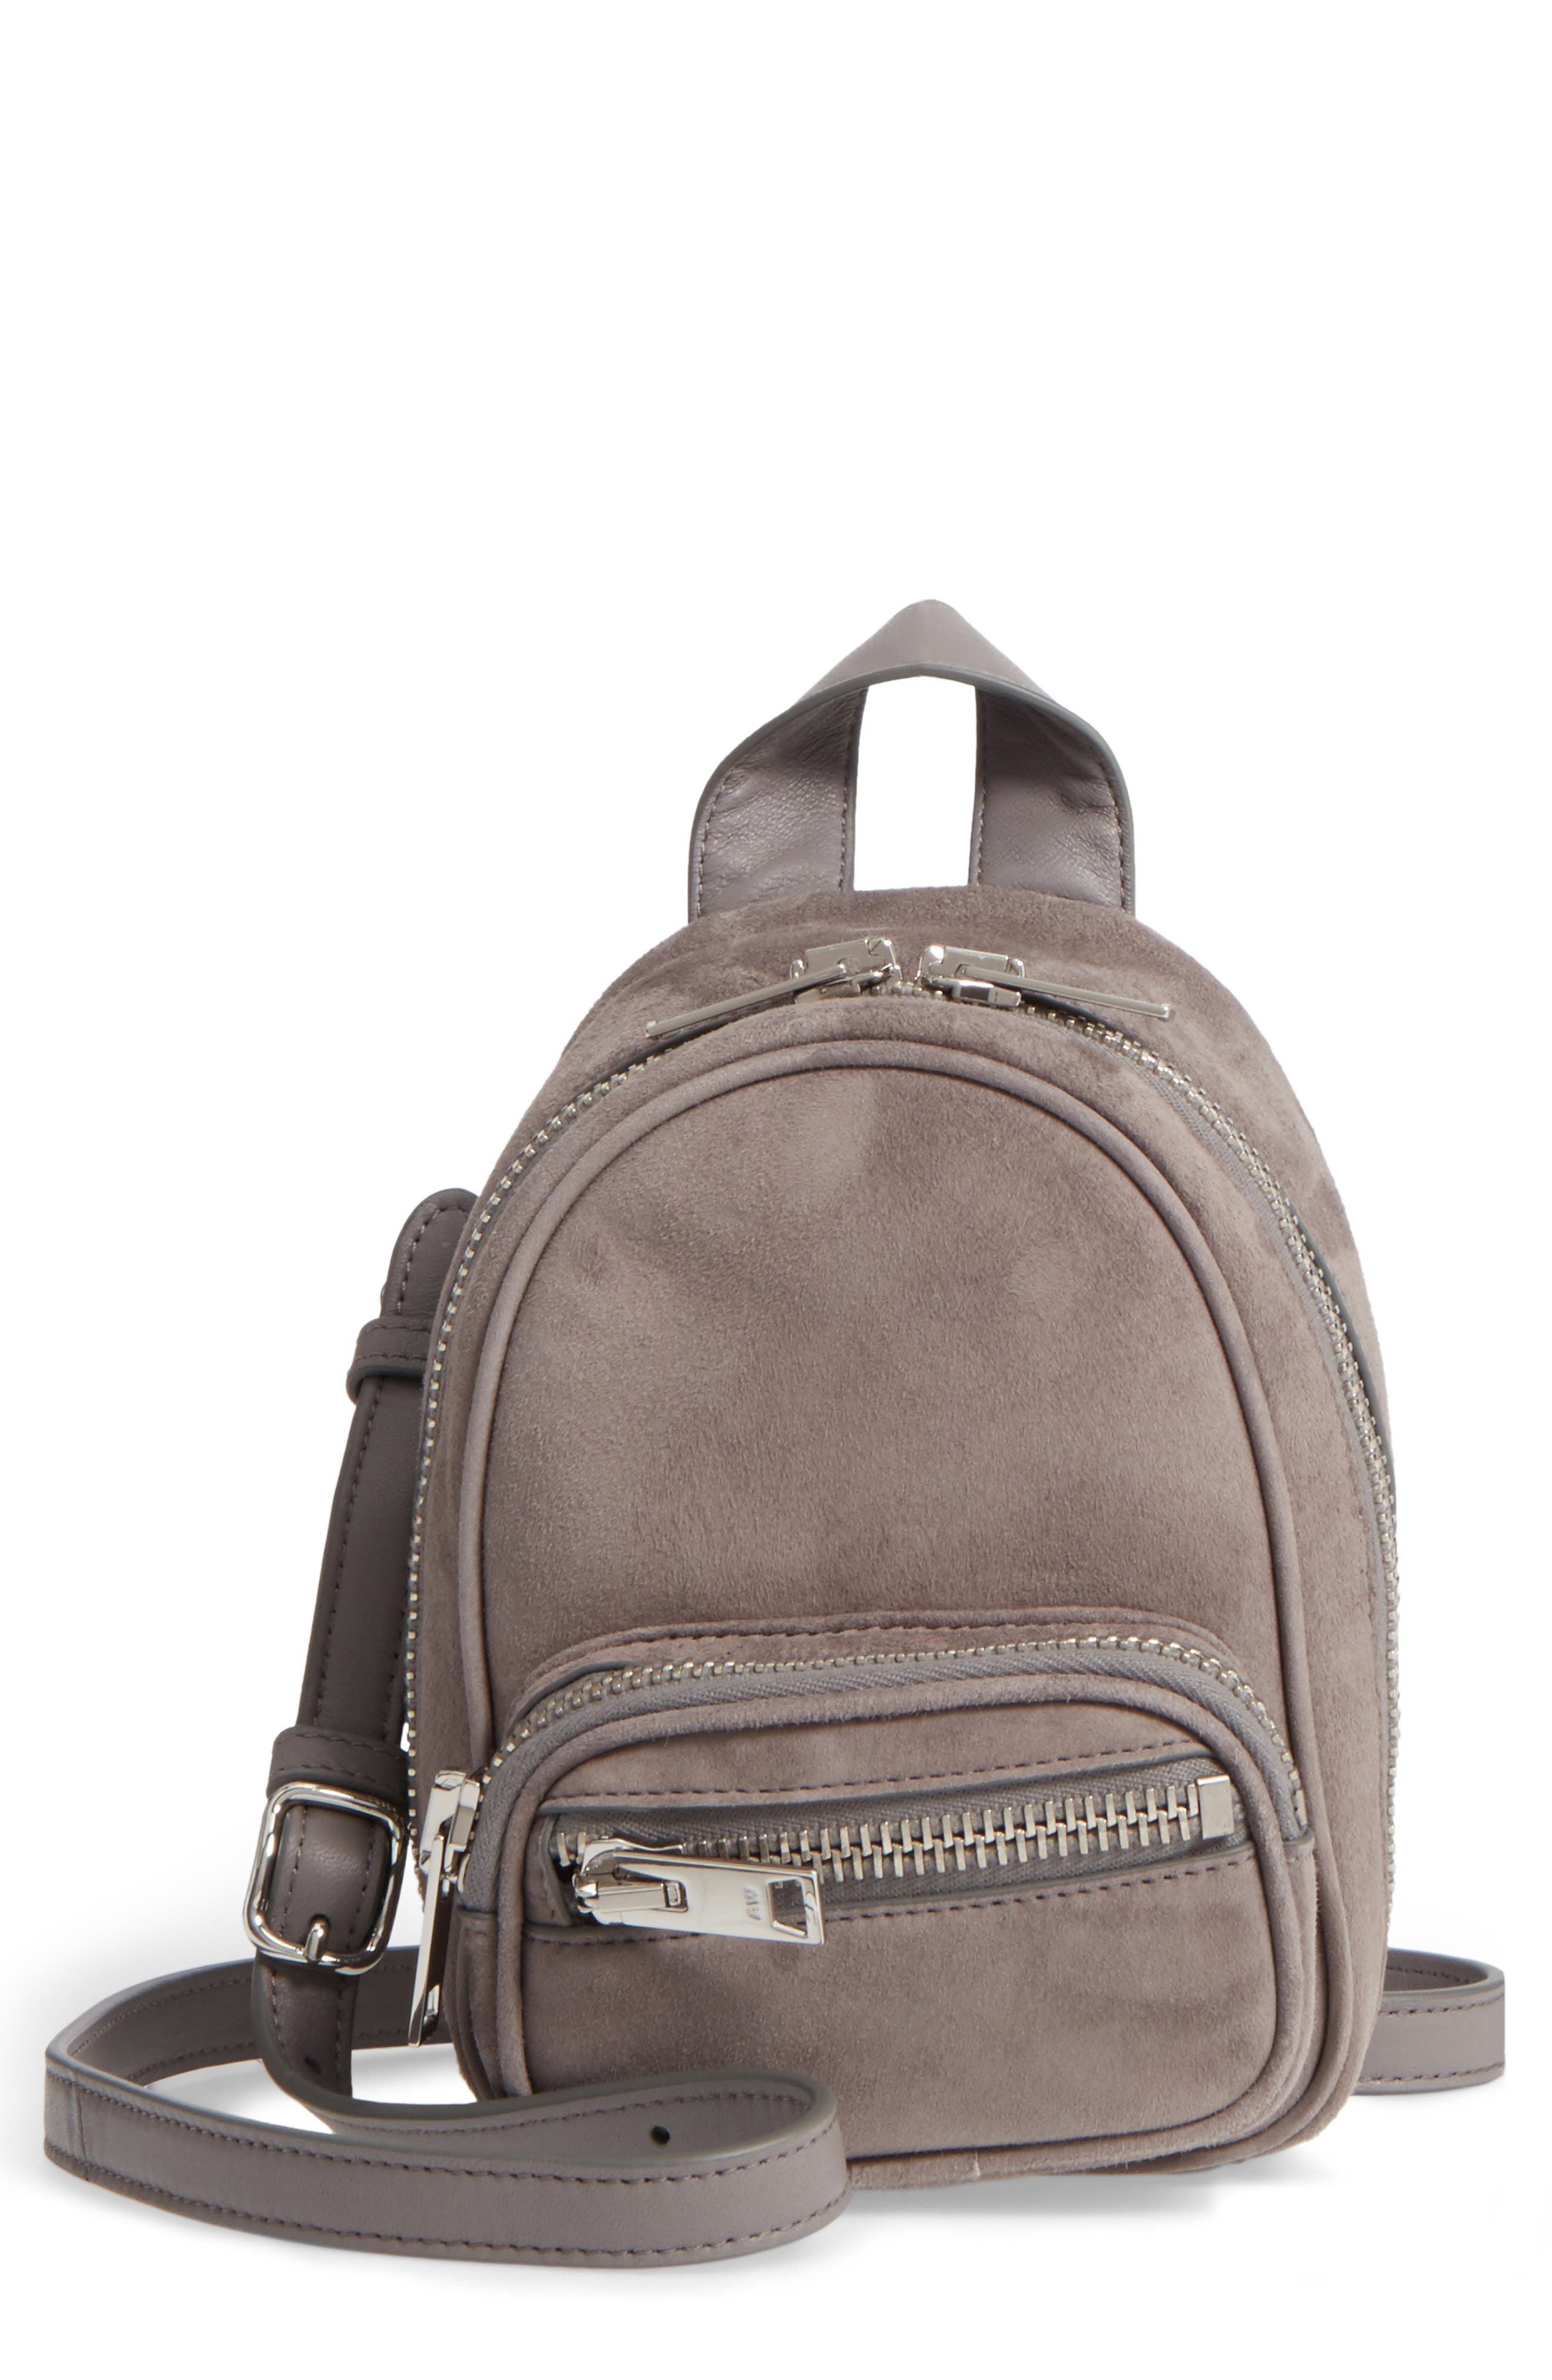 Mini Attica Leather Crossbody Backpack,                         Main,                         color, 080